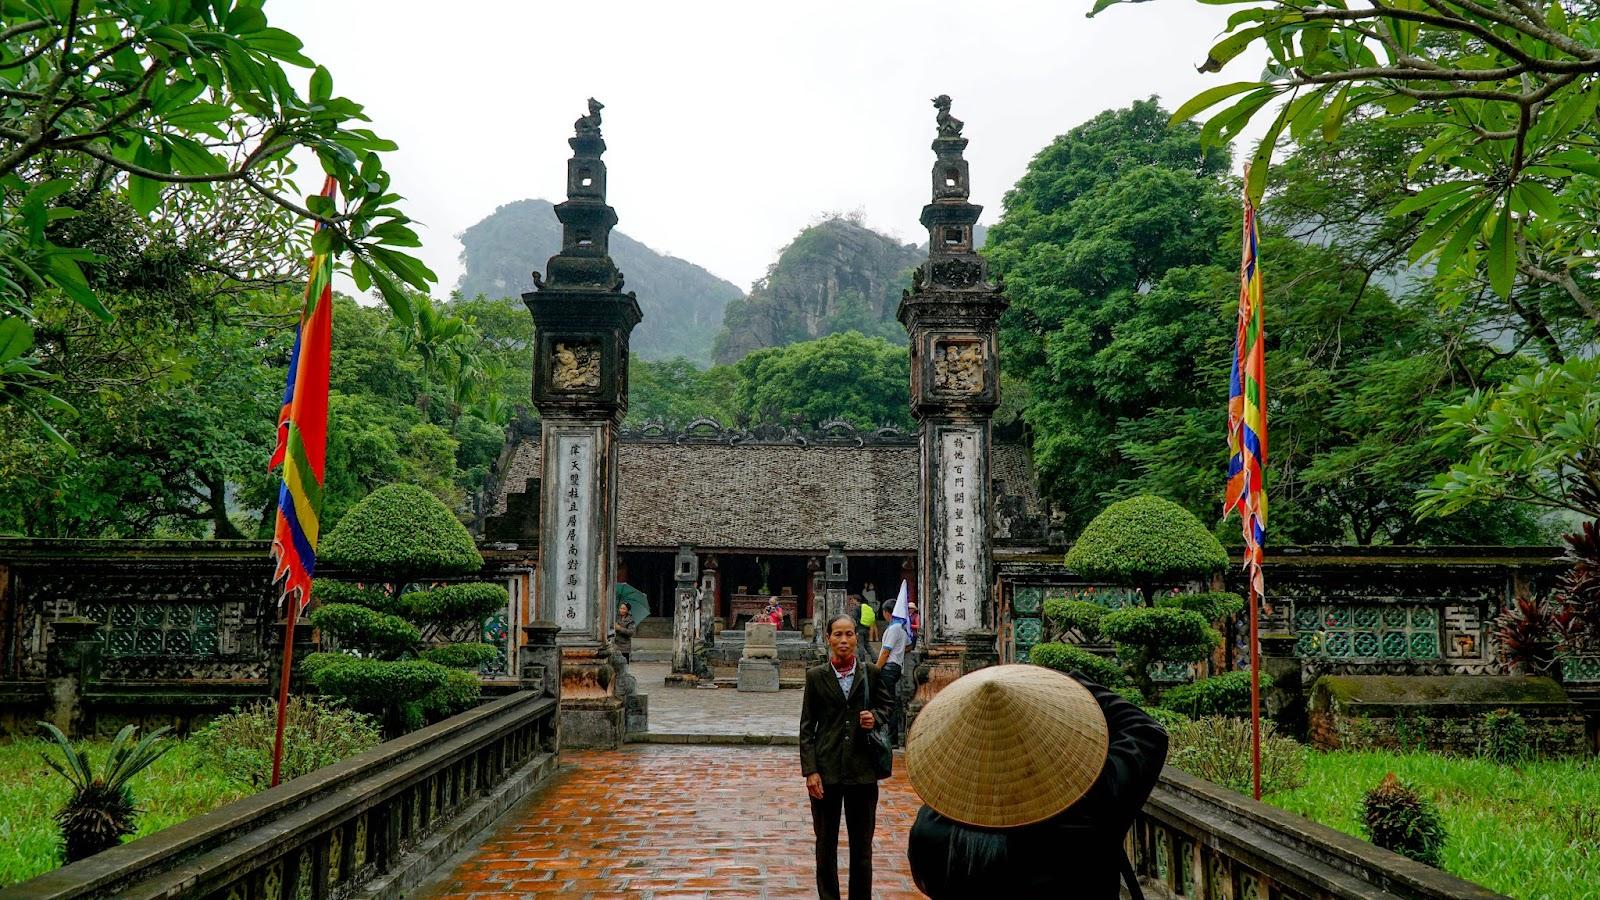 Dinh Tien Hoang temple in Hoa Lu